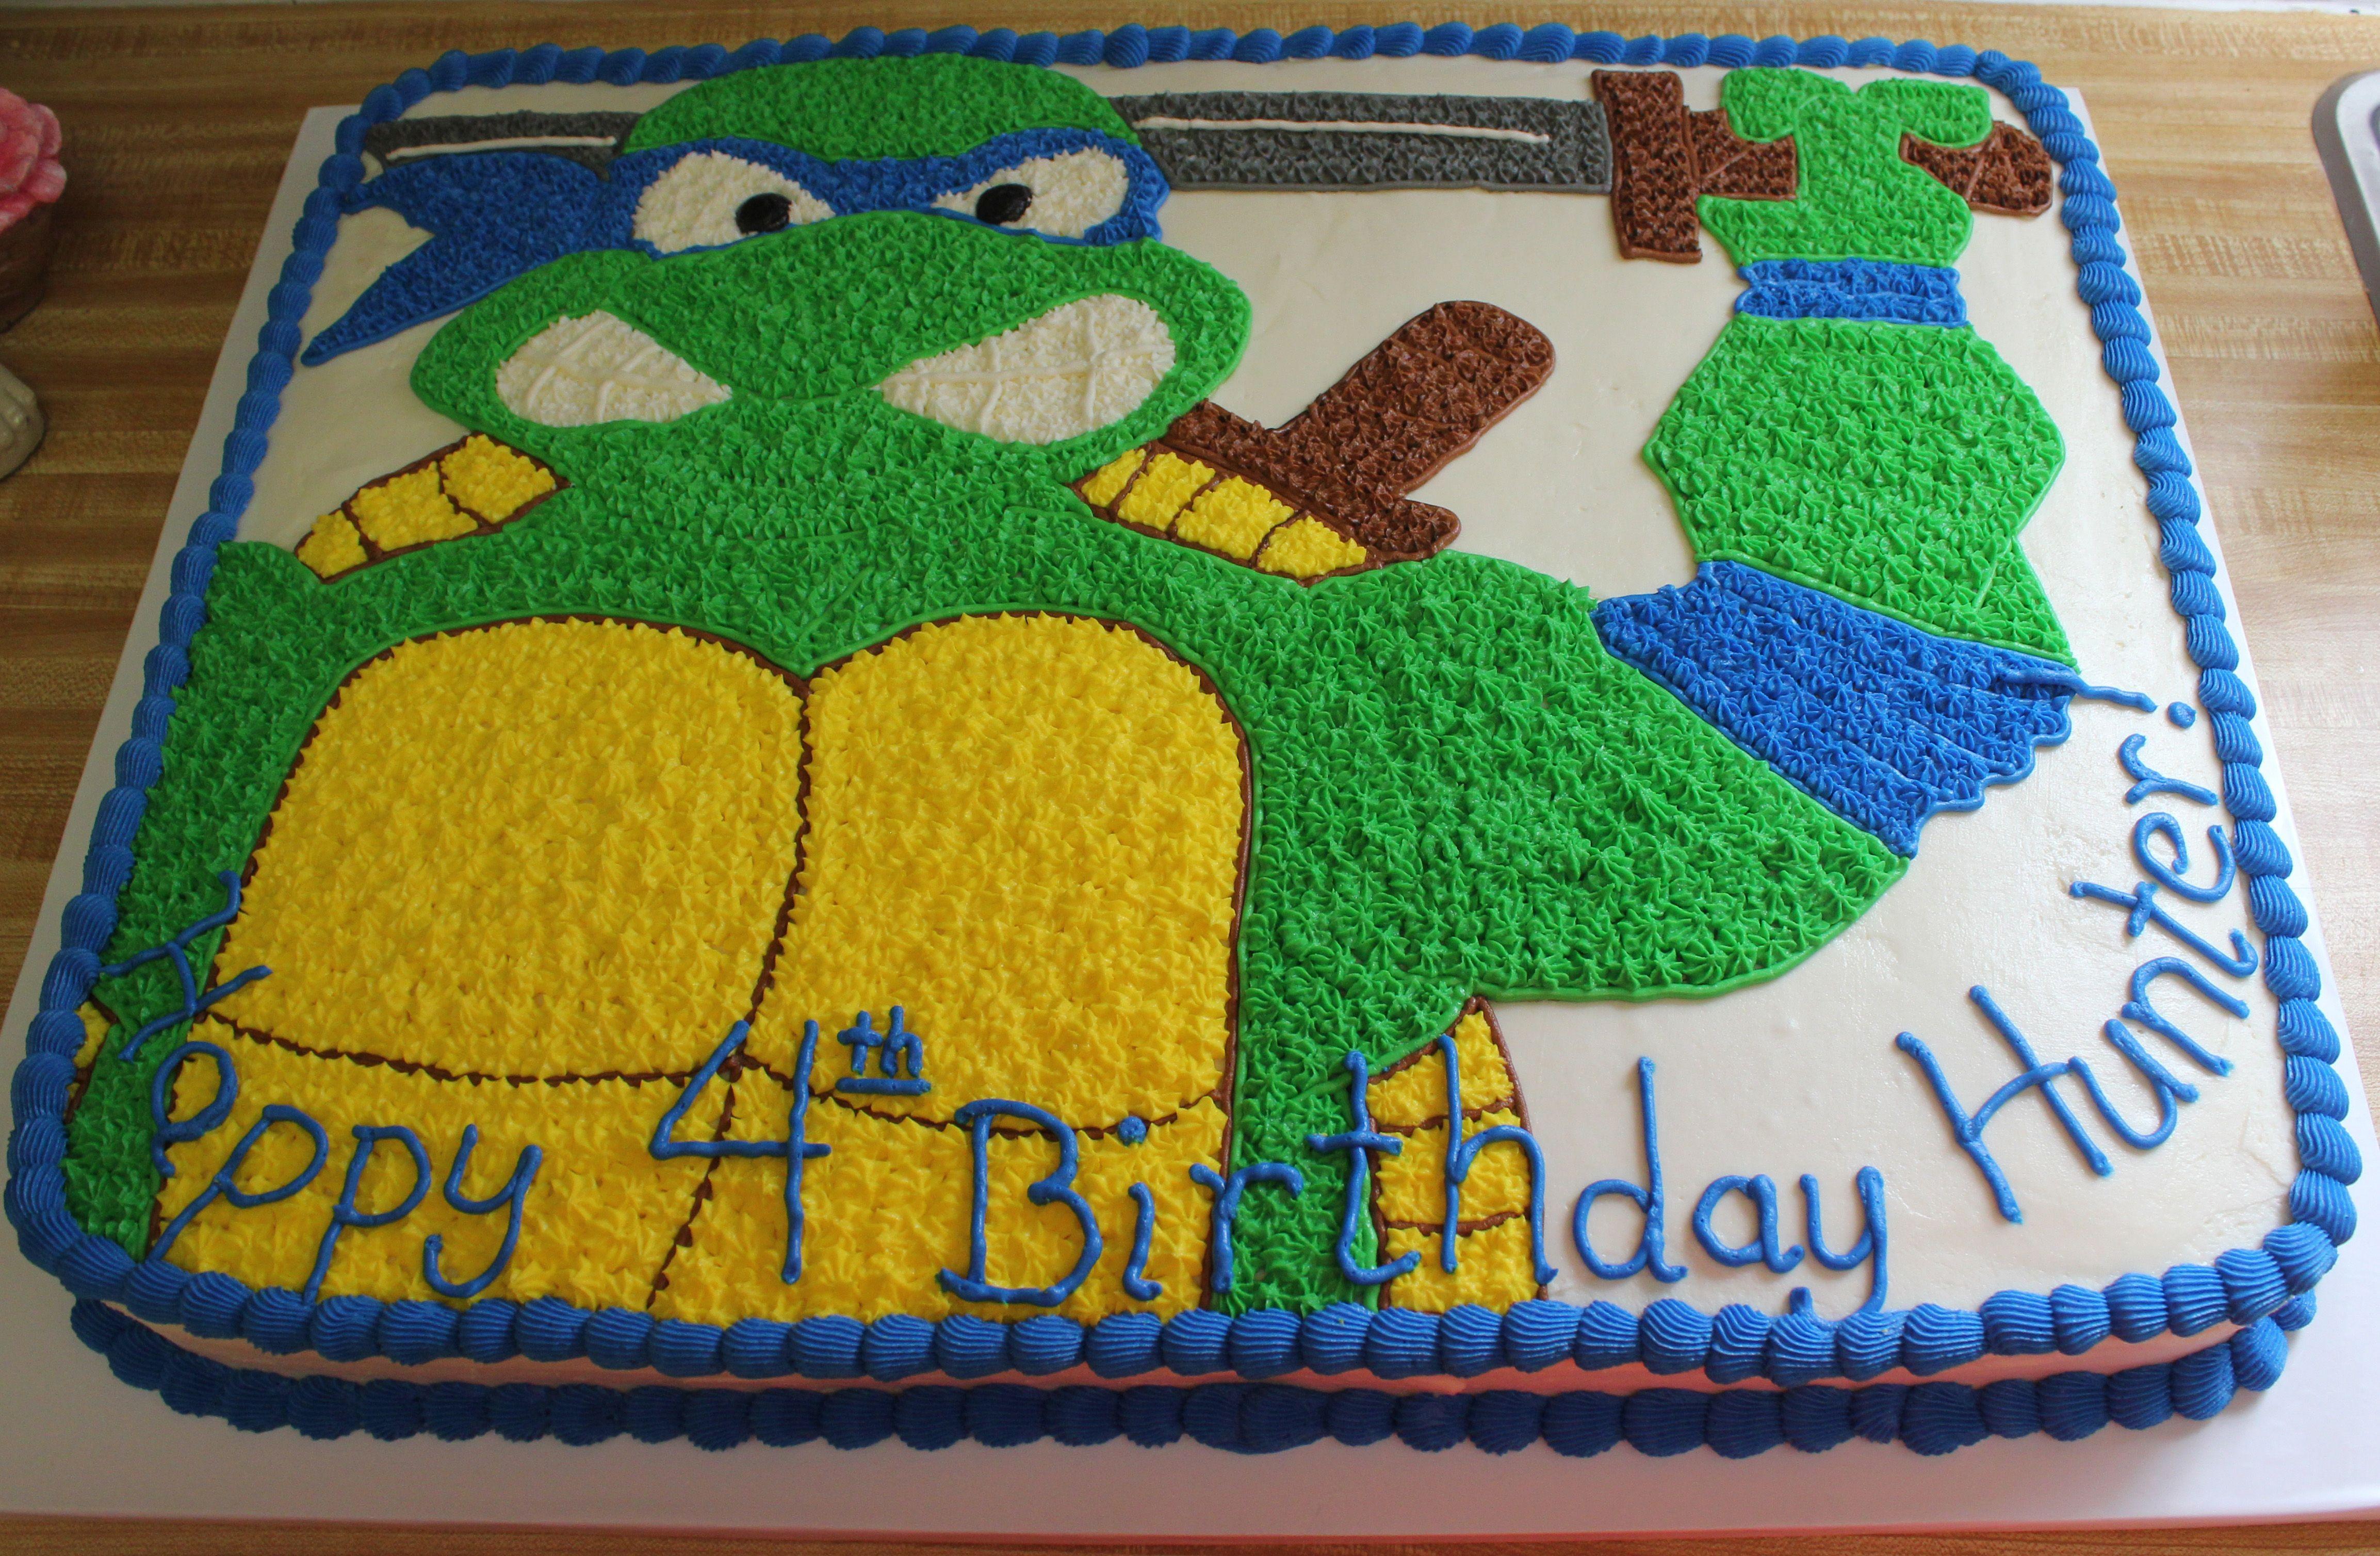 Teenage Mutant Ninja Turtles sheet cake by Susans Cake Studio My